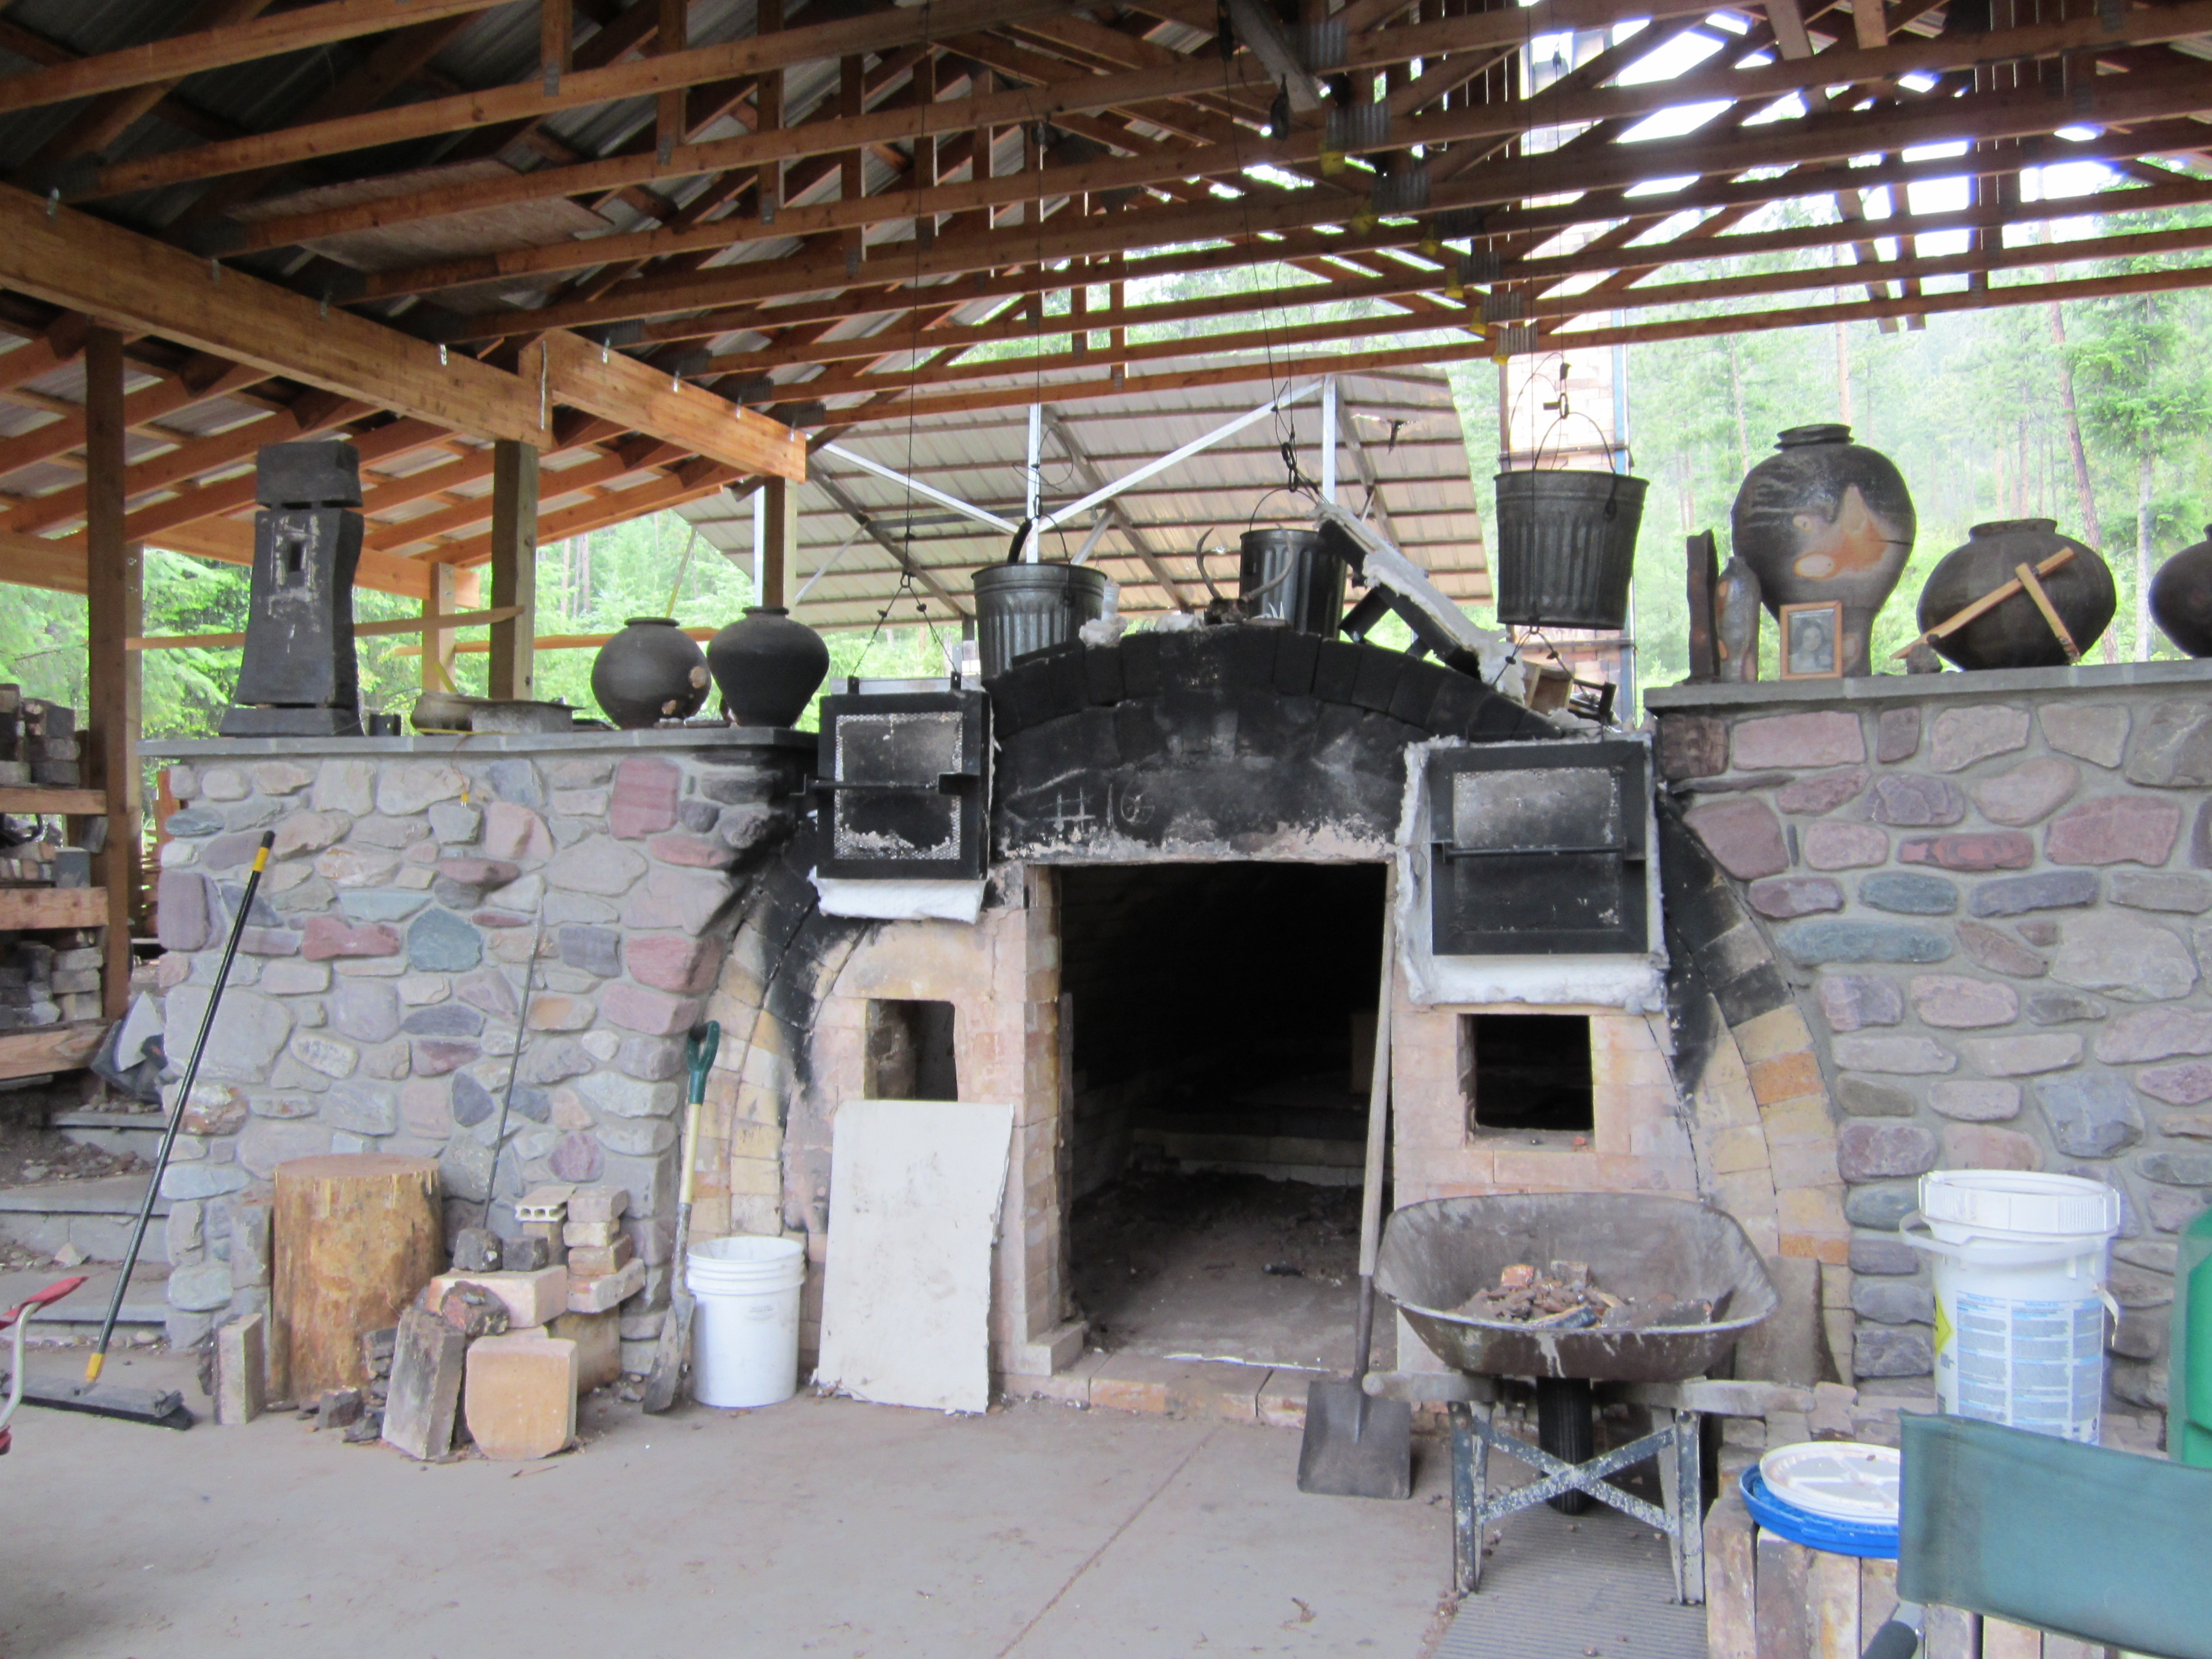 The Clay Studio of Missoula